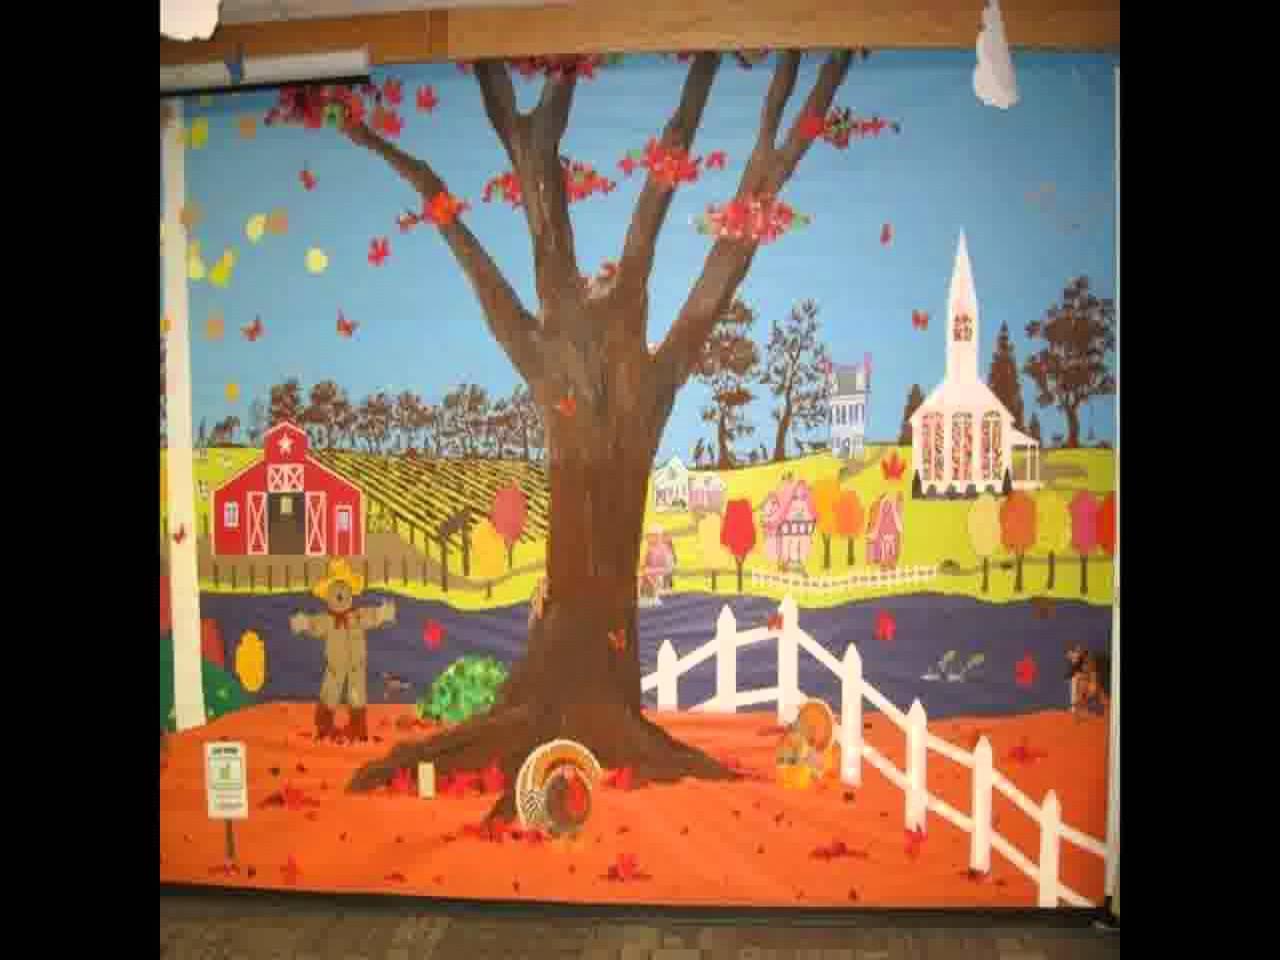 10 Lovable Fall Preschool Bulletin Board Ideas attractive inspiration bulletin board ideas preschool awesome fall 2020